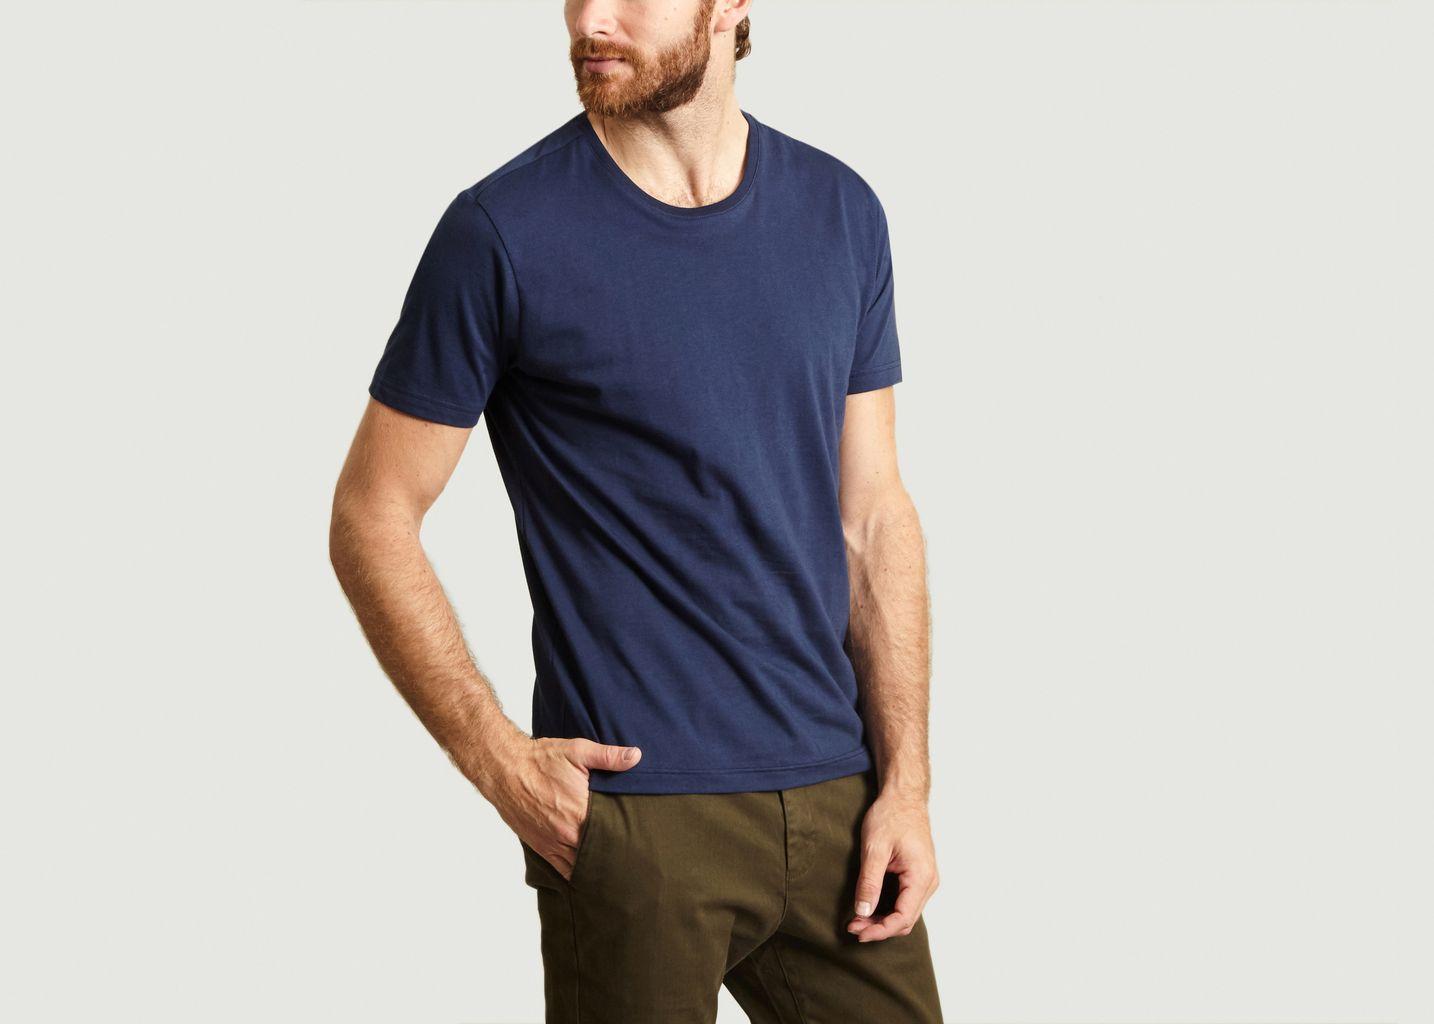 T-shirt Manches Courtes - JagVi